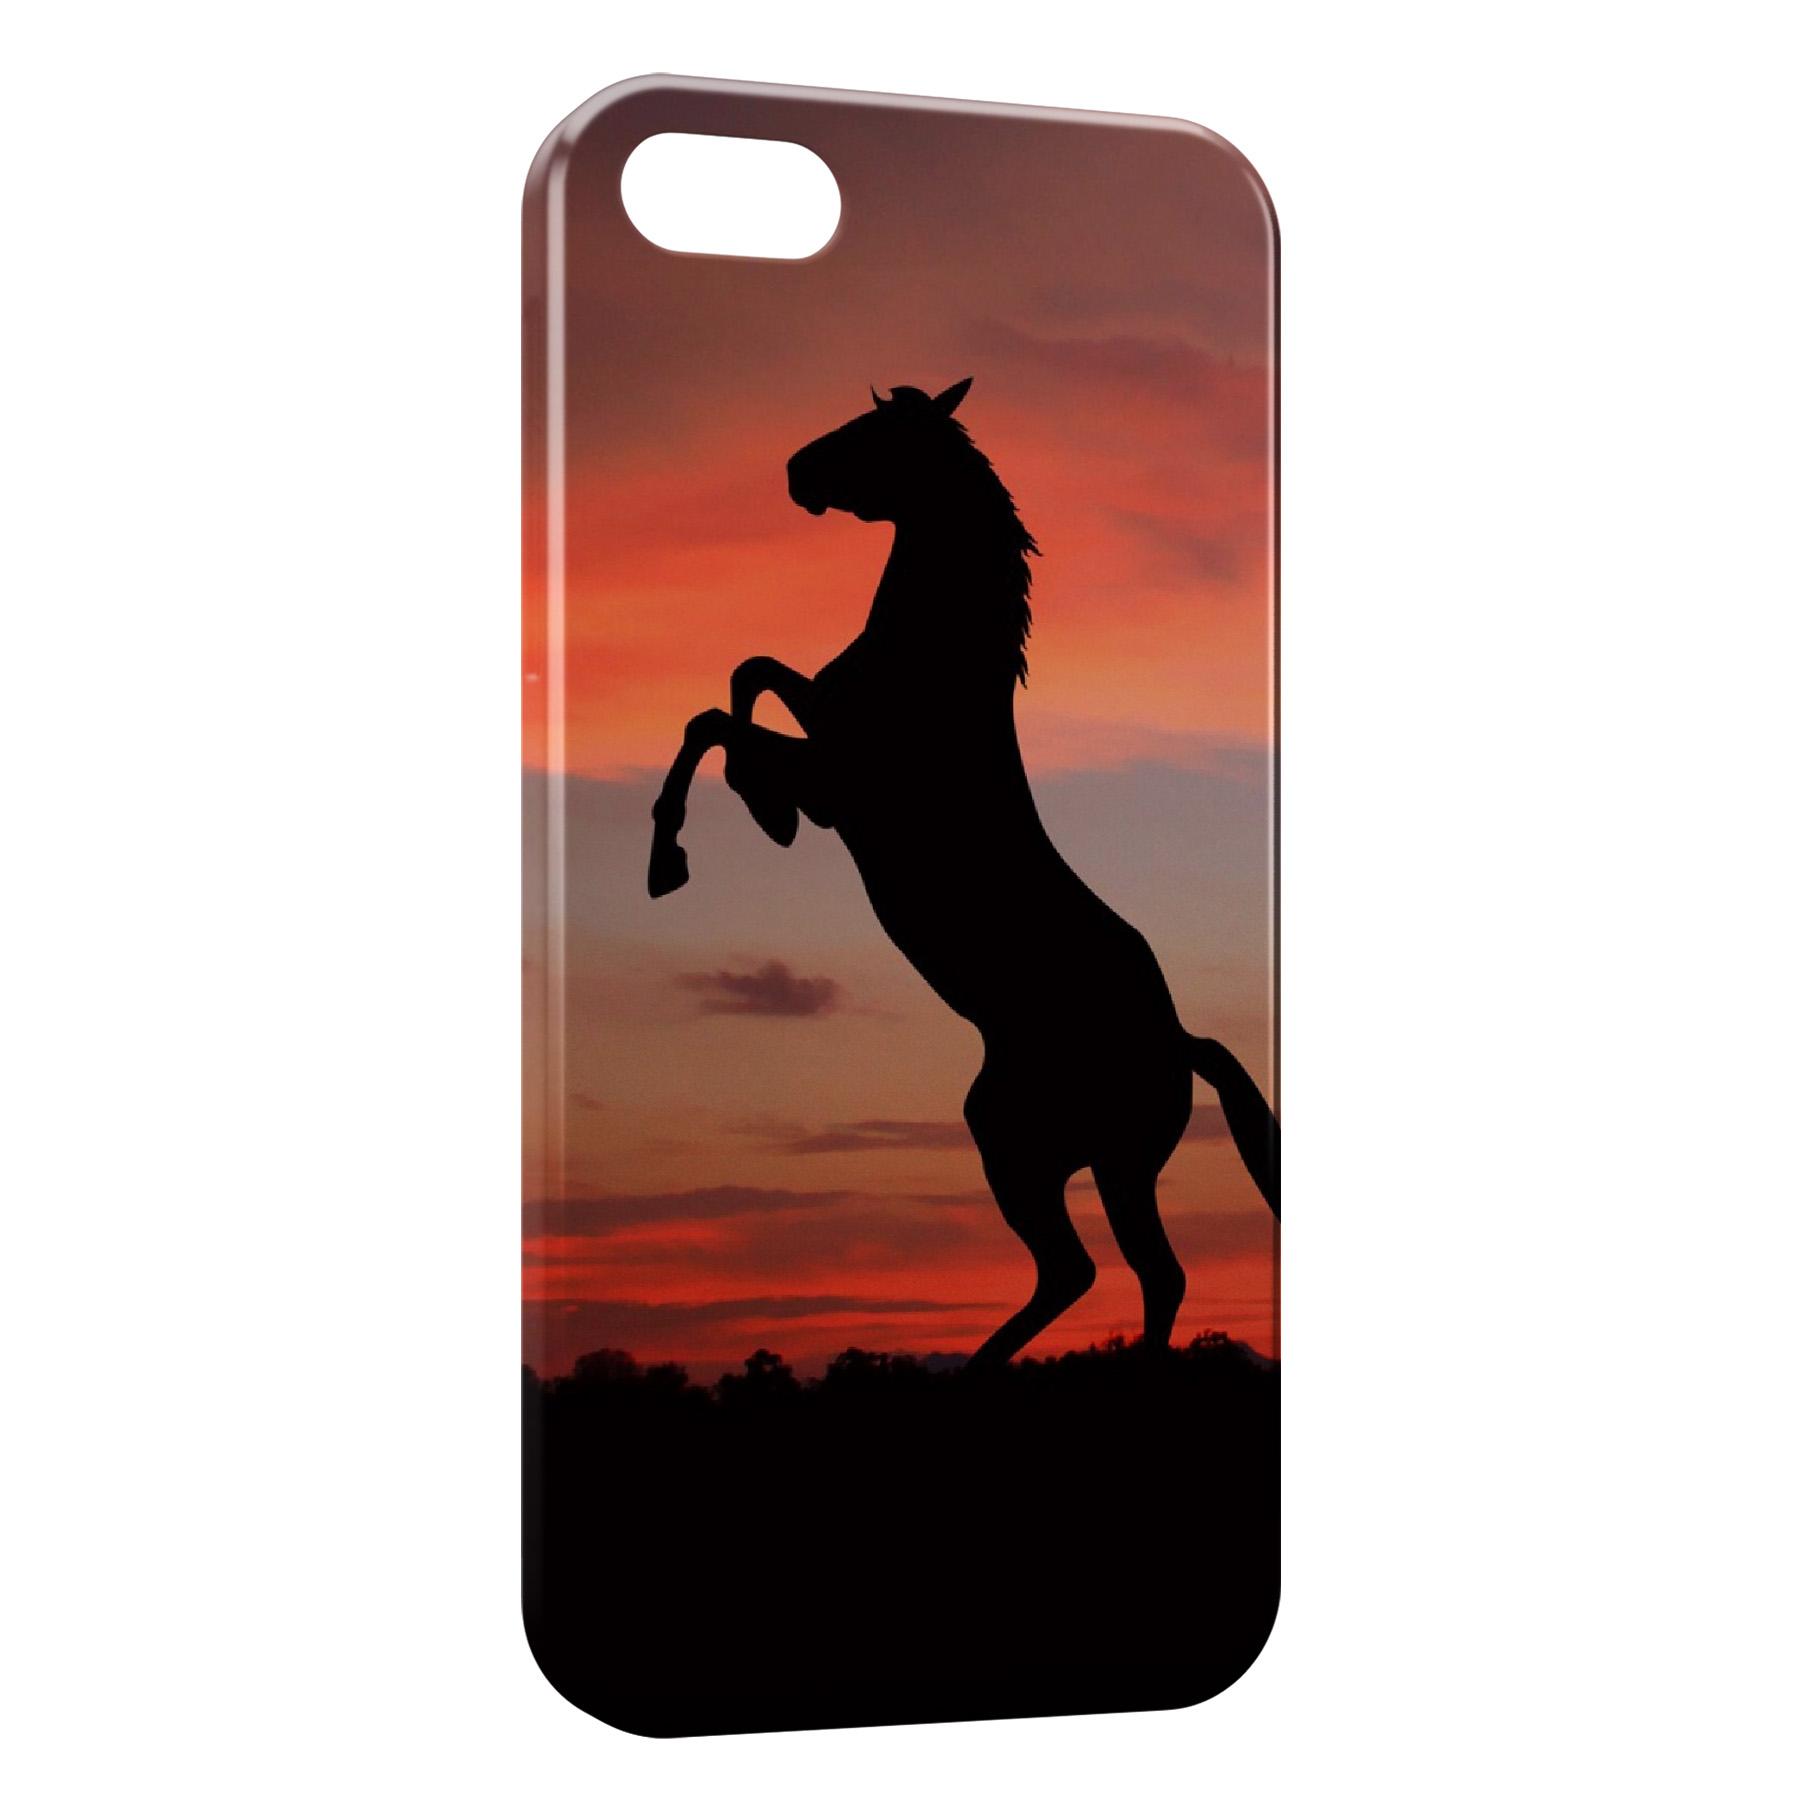 Coque iPhone 55SSE Cheval Cabré 2 Sunset